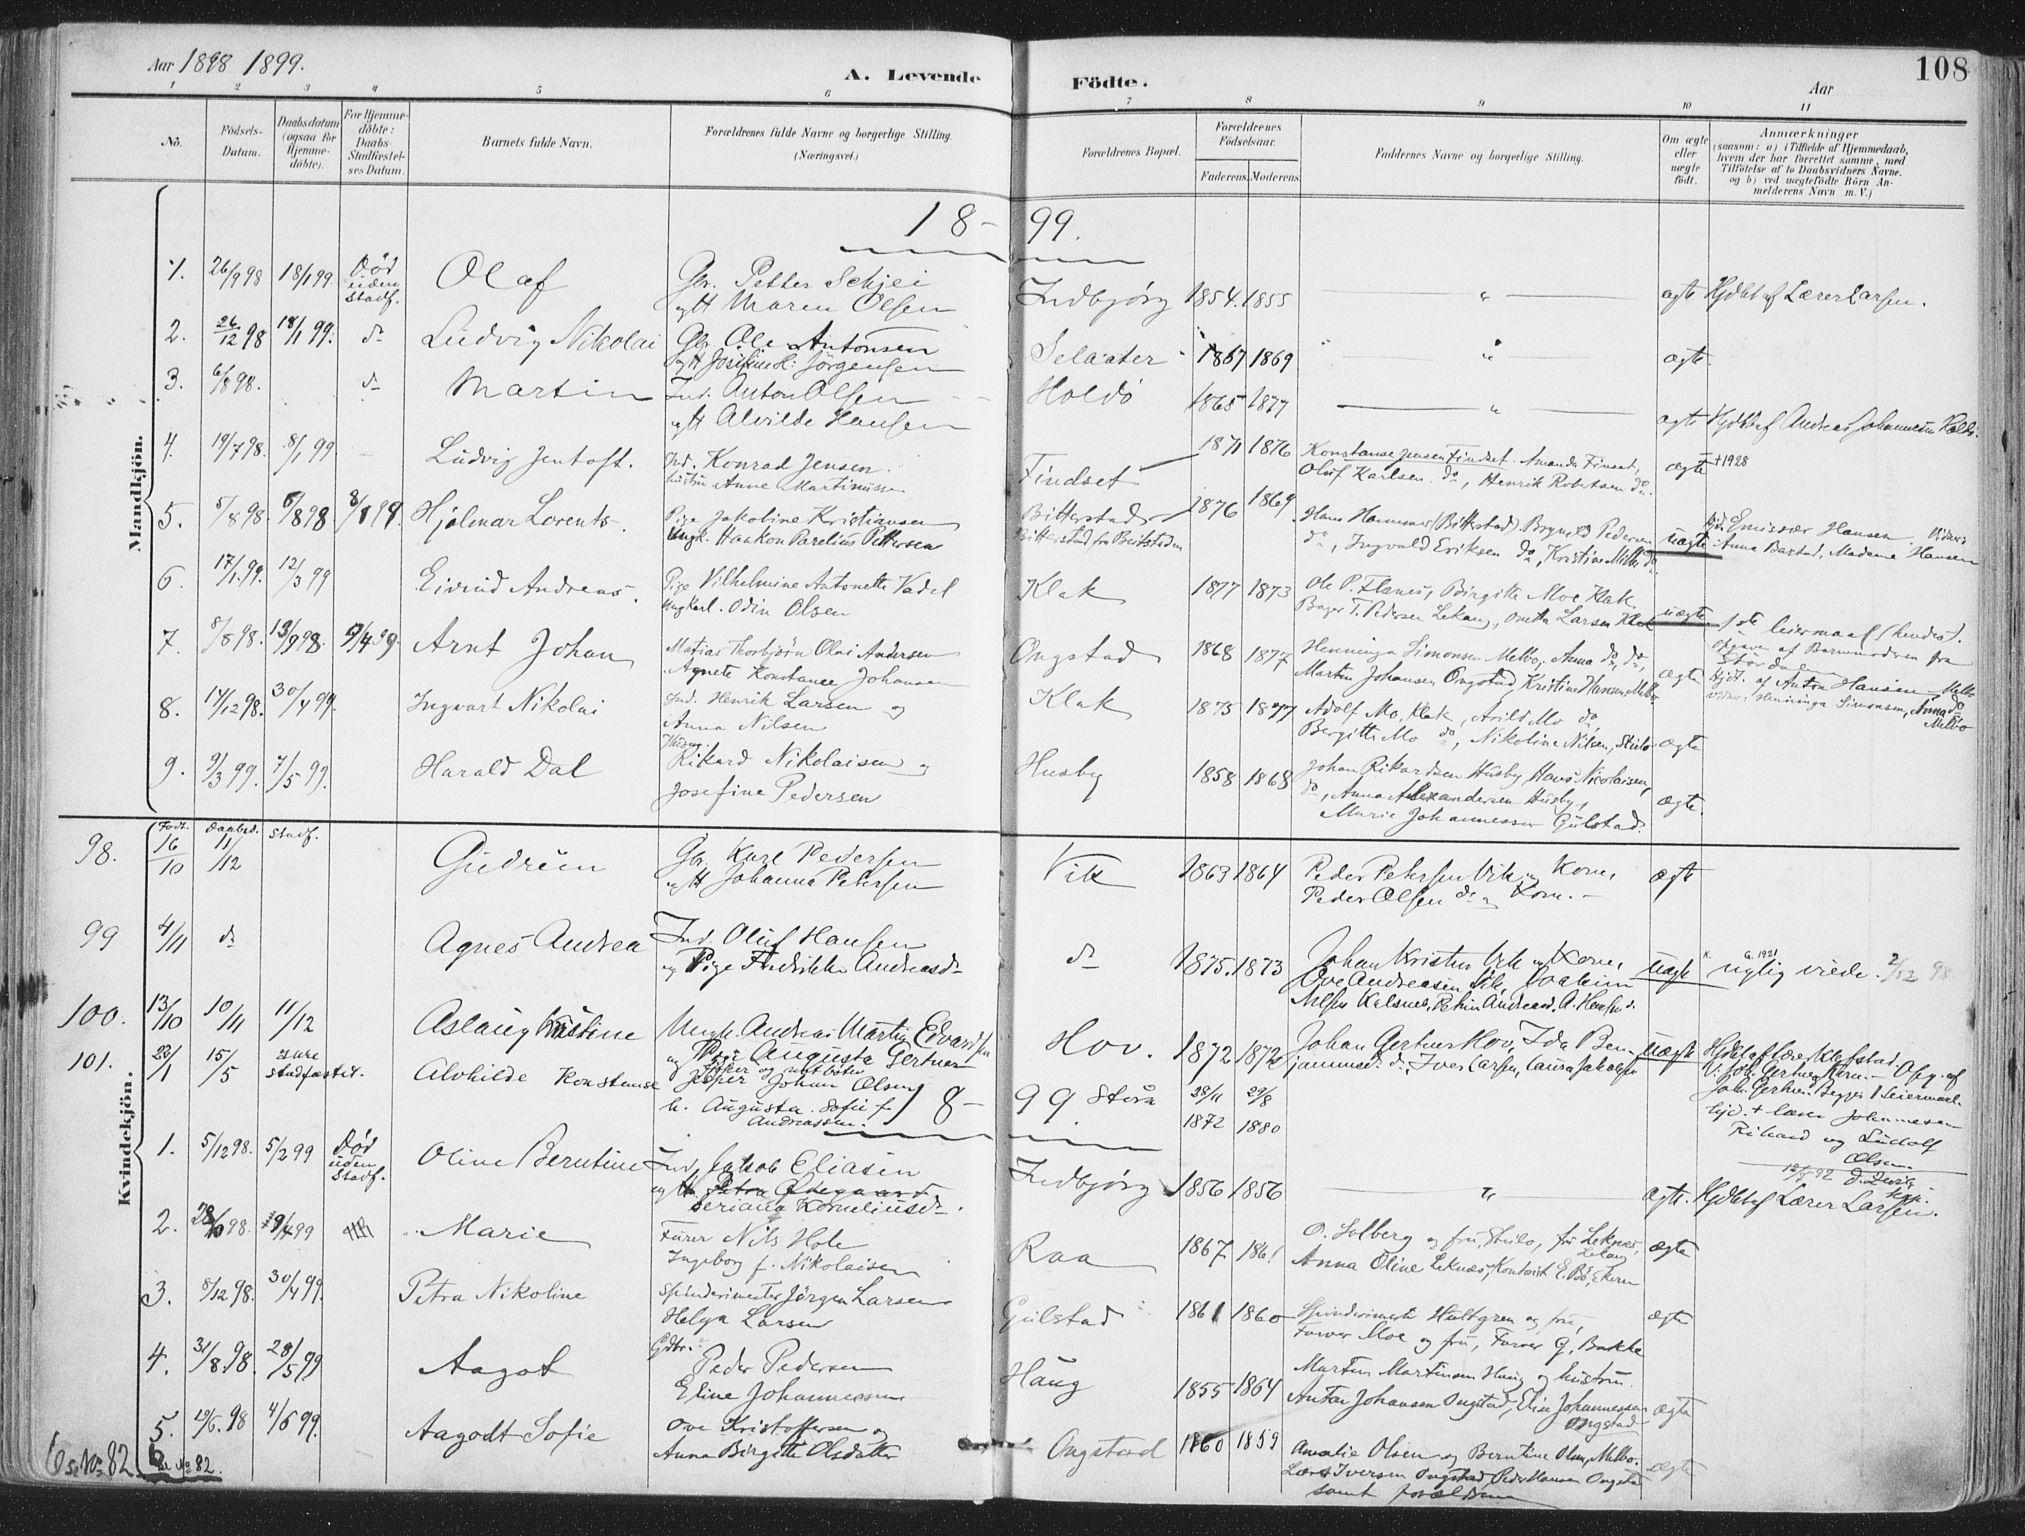 SAT, Ministerialprotokoller, klokkerbøker og fødselsregistre - Nordland, 888/L1246: Ministerialbok nr. 888A12, 1891-1903, s. 108